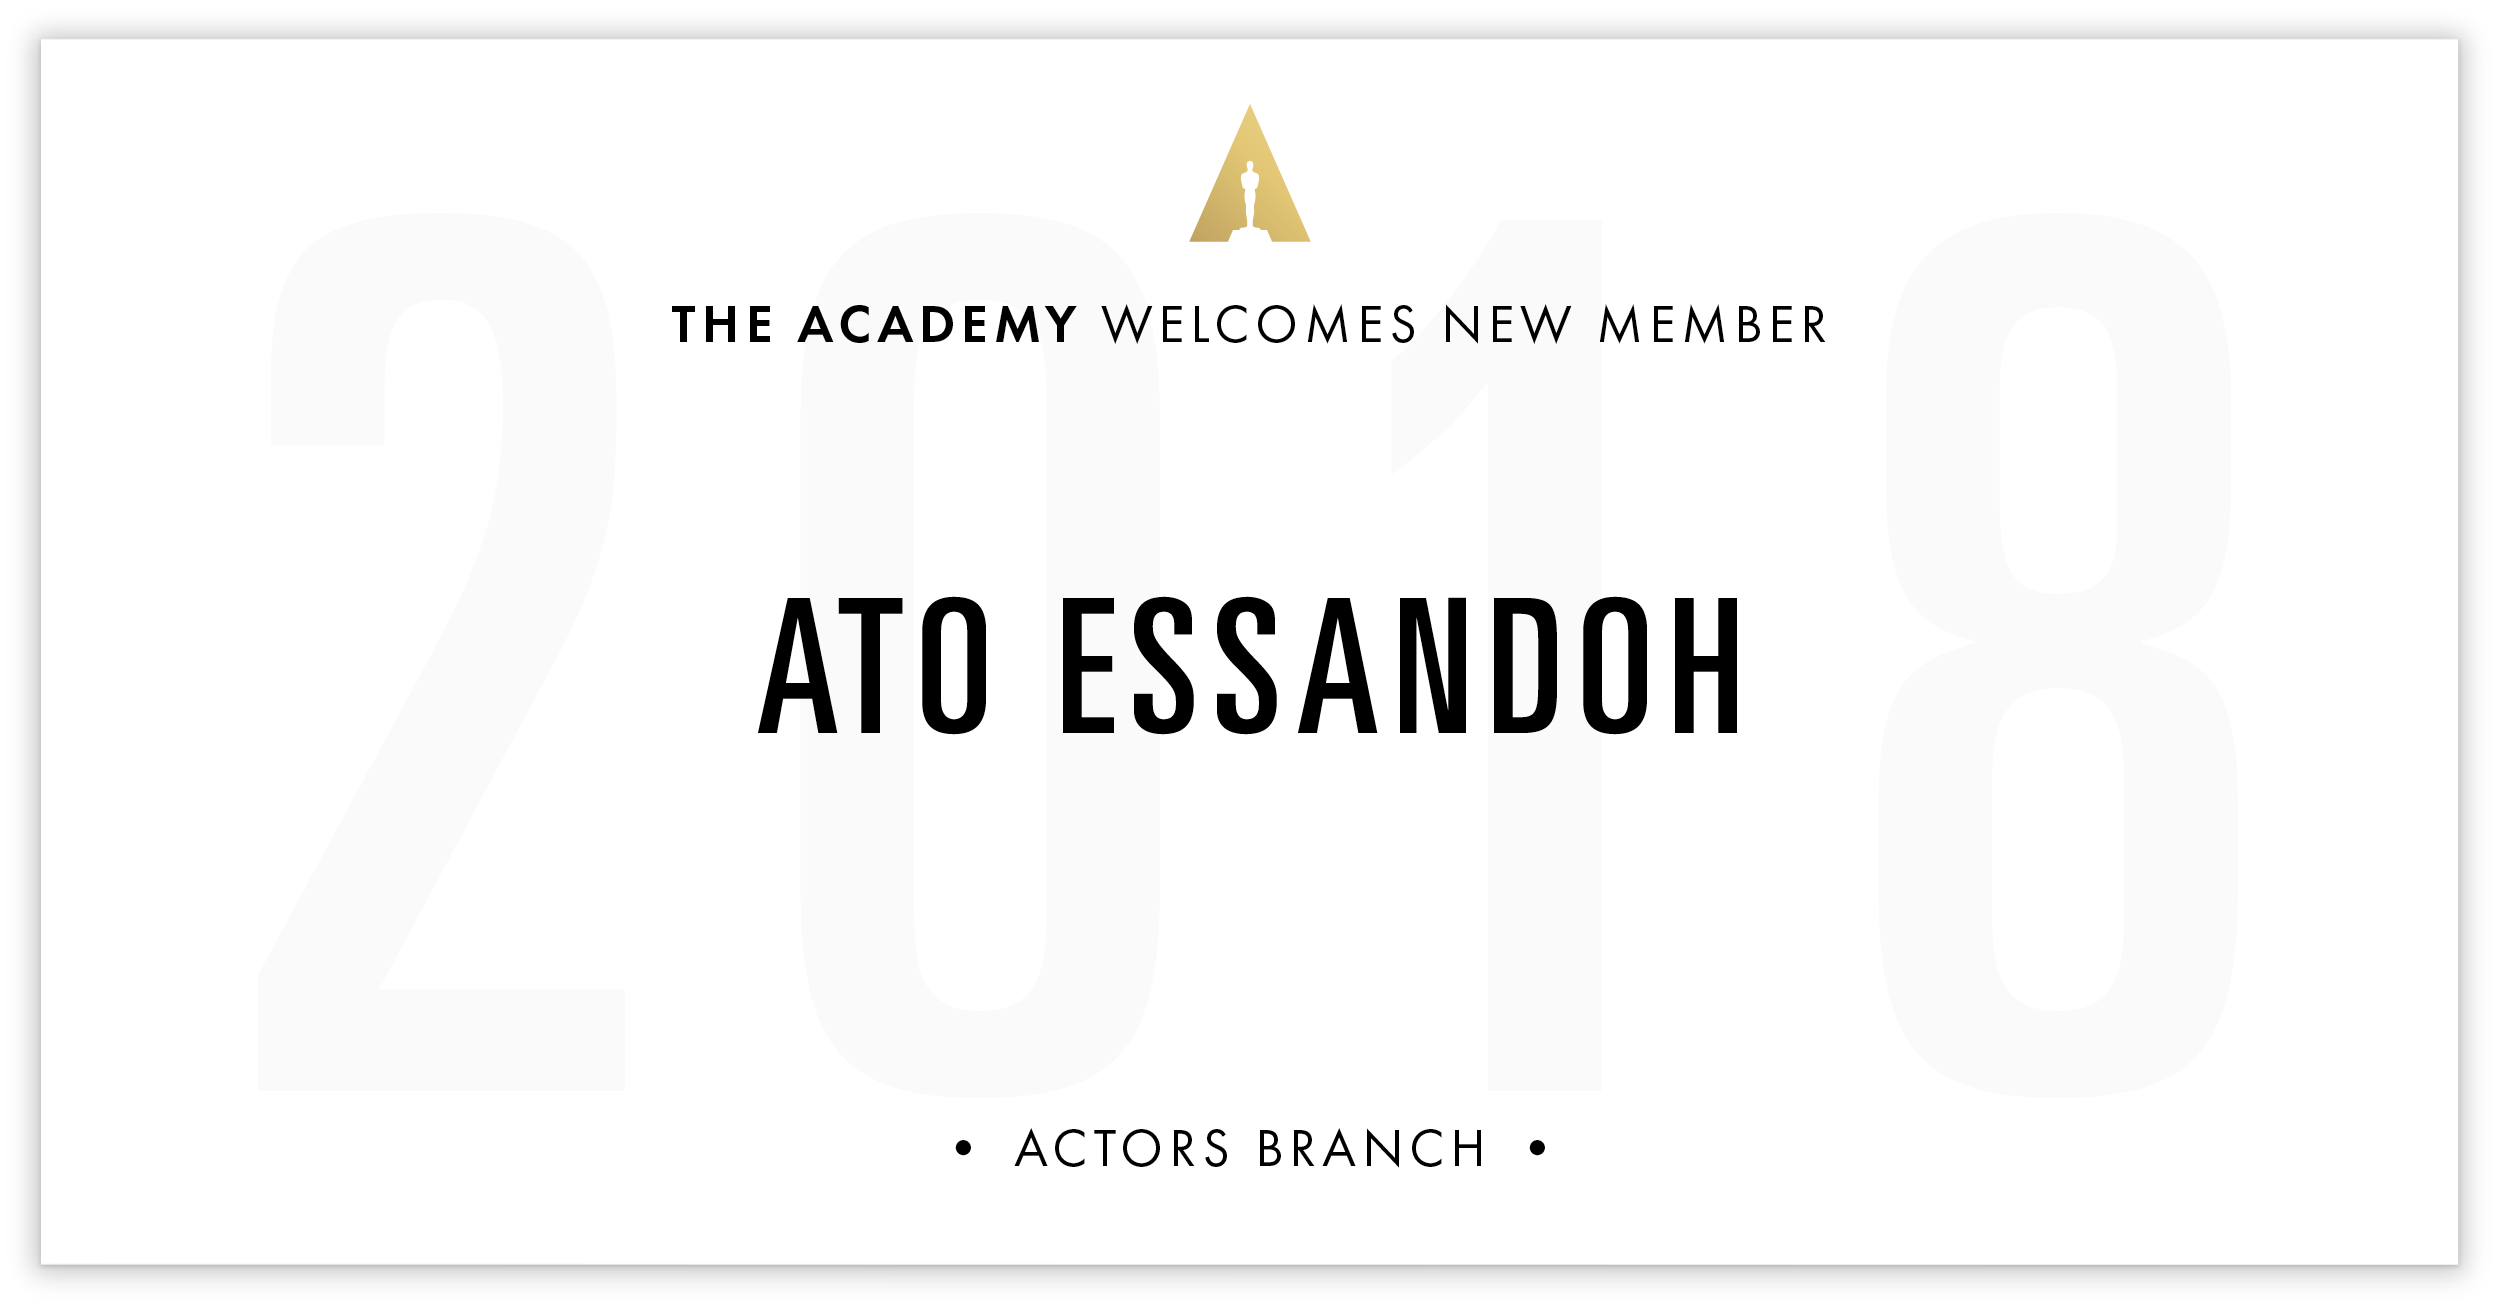 Ato Essandoh is invited!